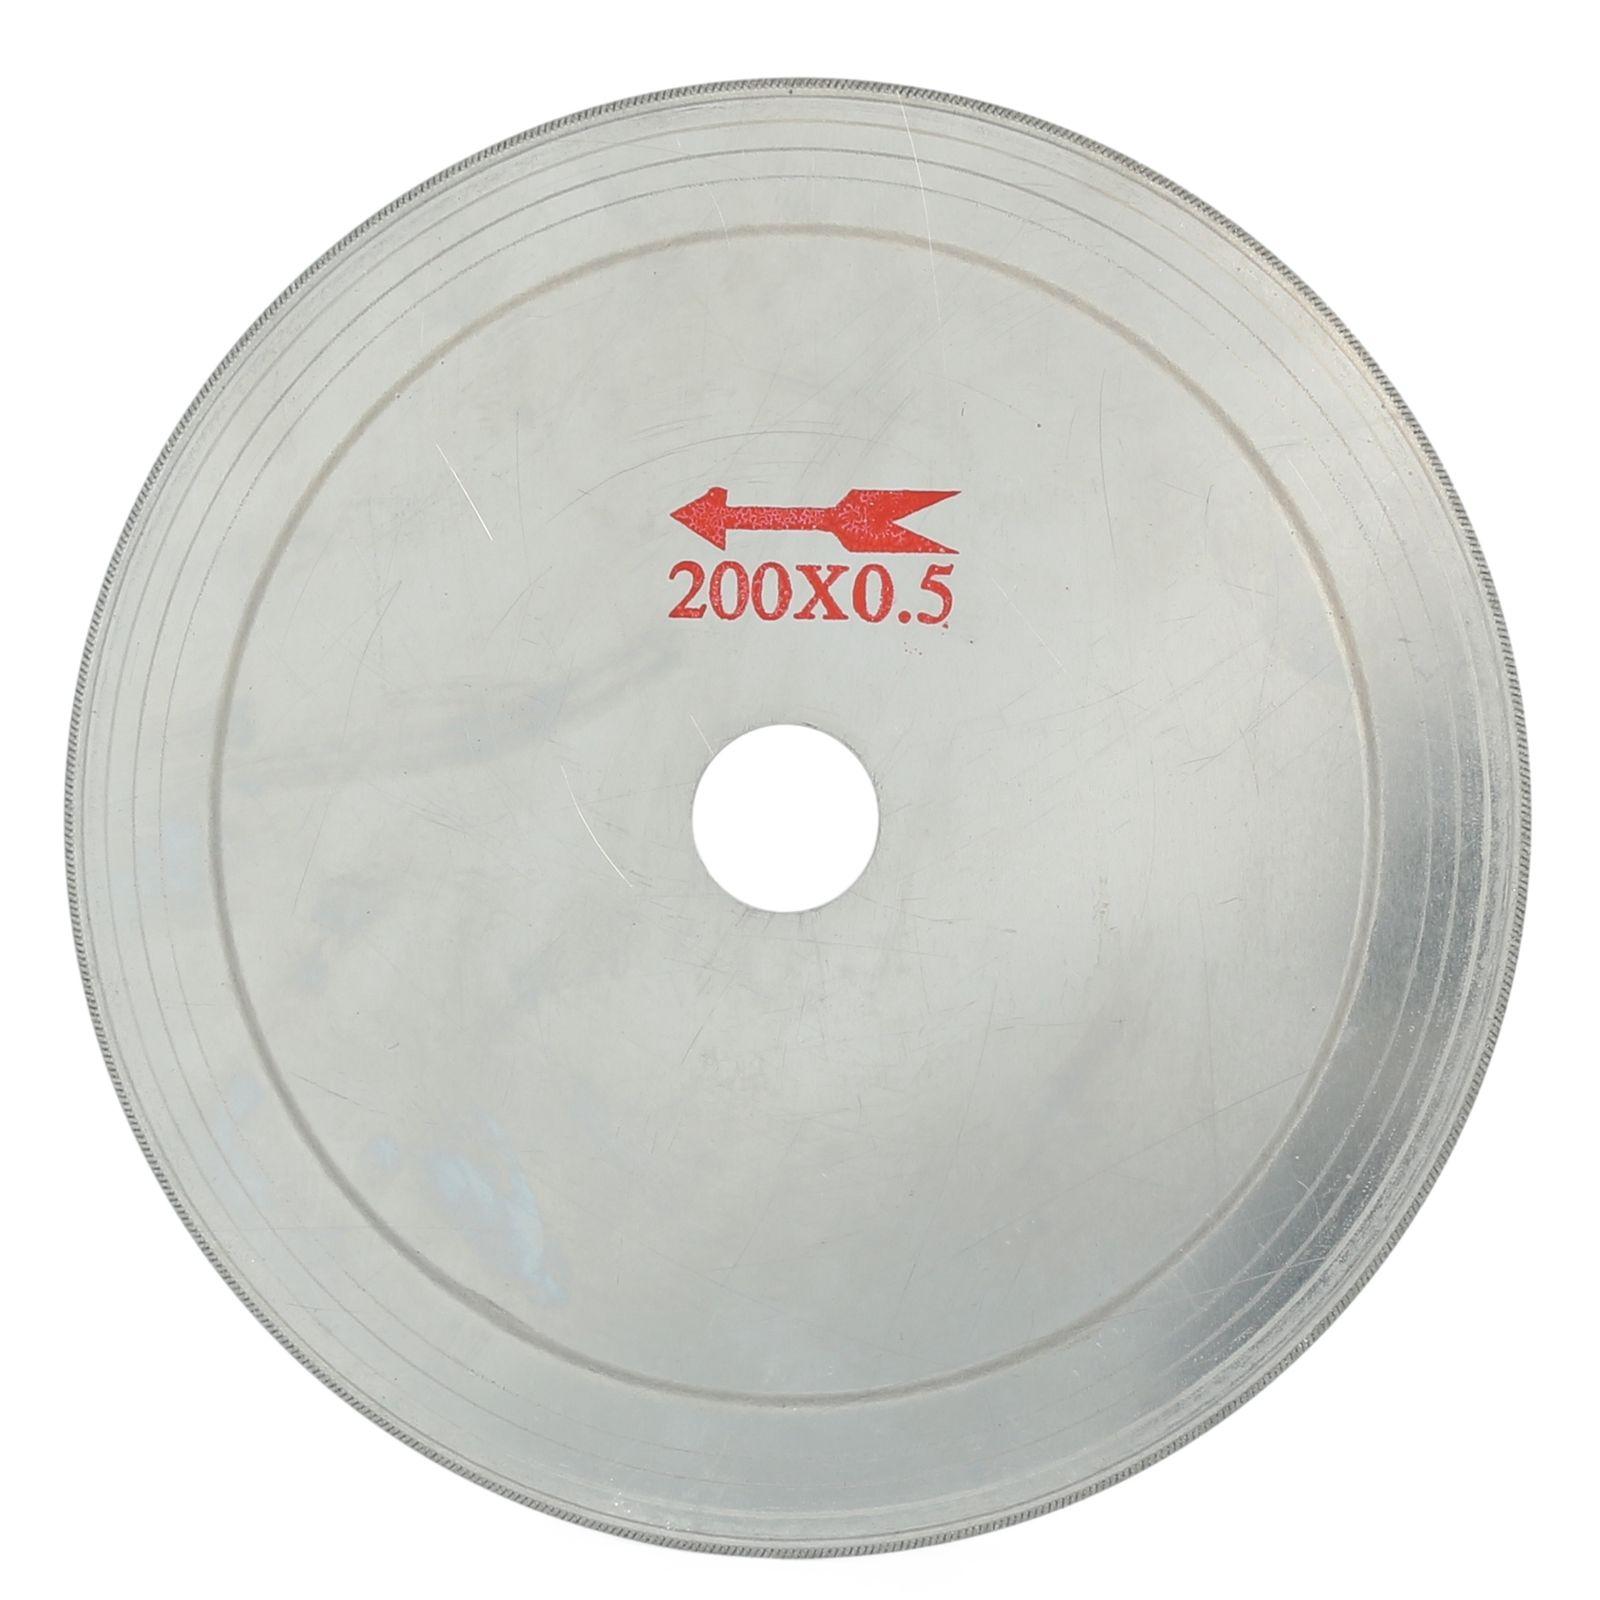 5Pcs 8 inch 200 mm Ultra-thin Diamond Lapidary Saw Blade Cutting Disc 0.65 Rim ILOVETOOL